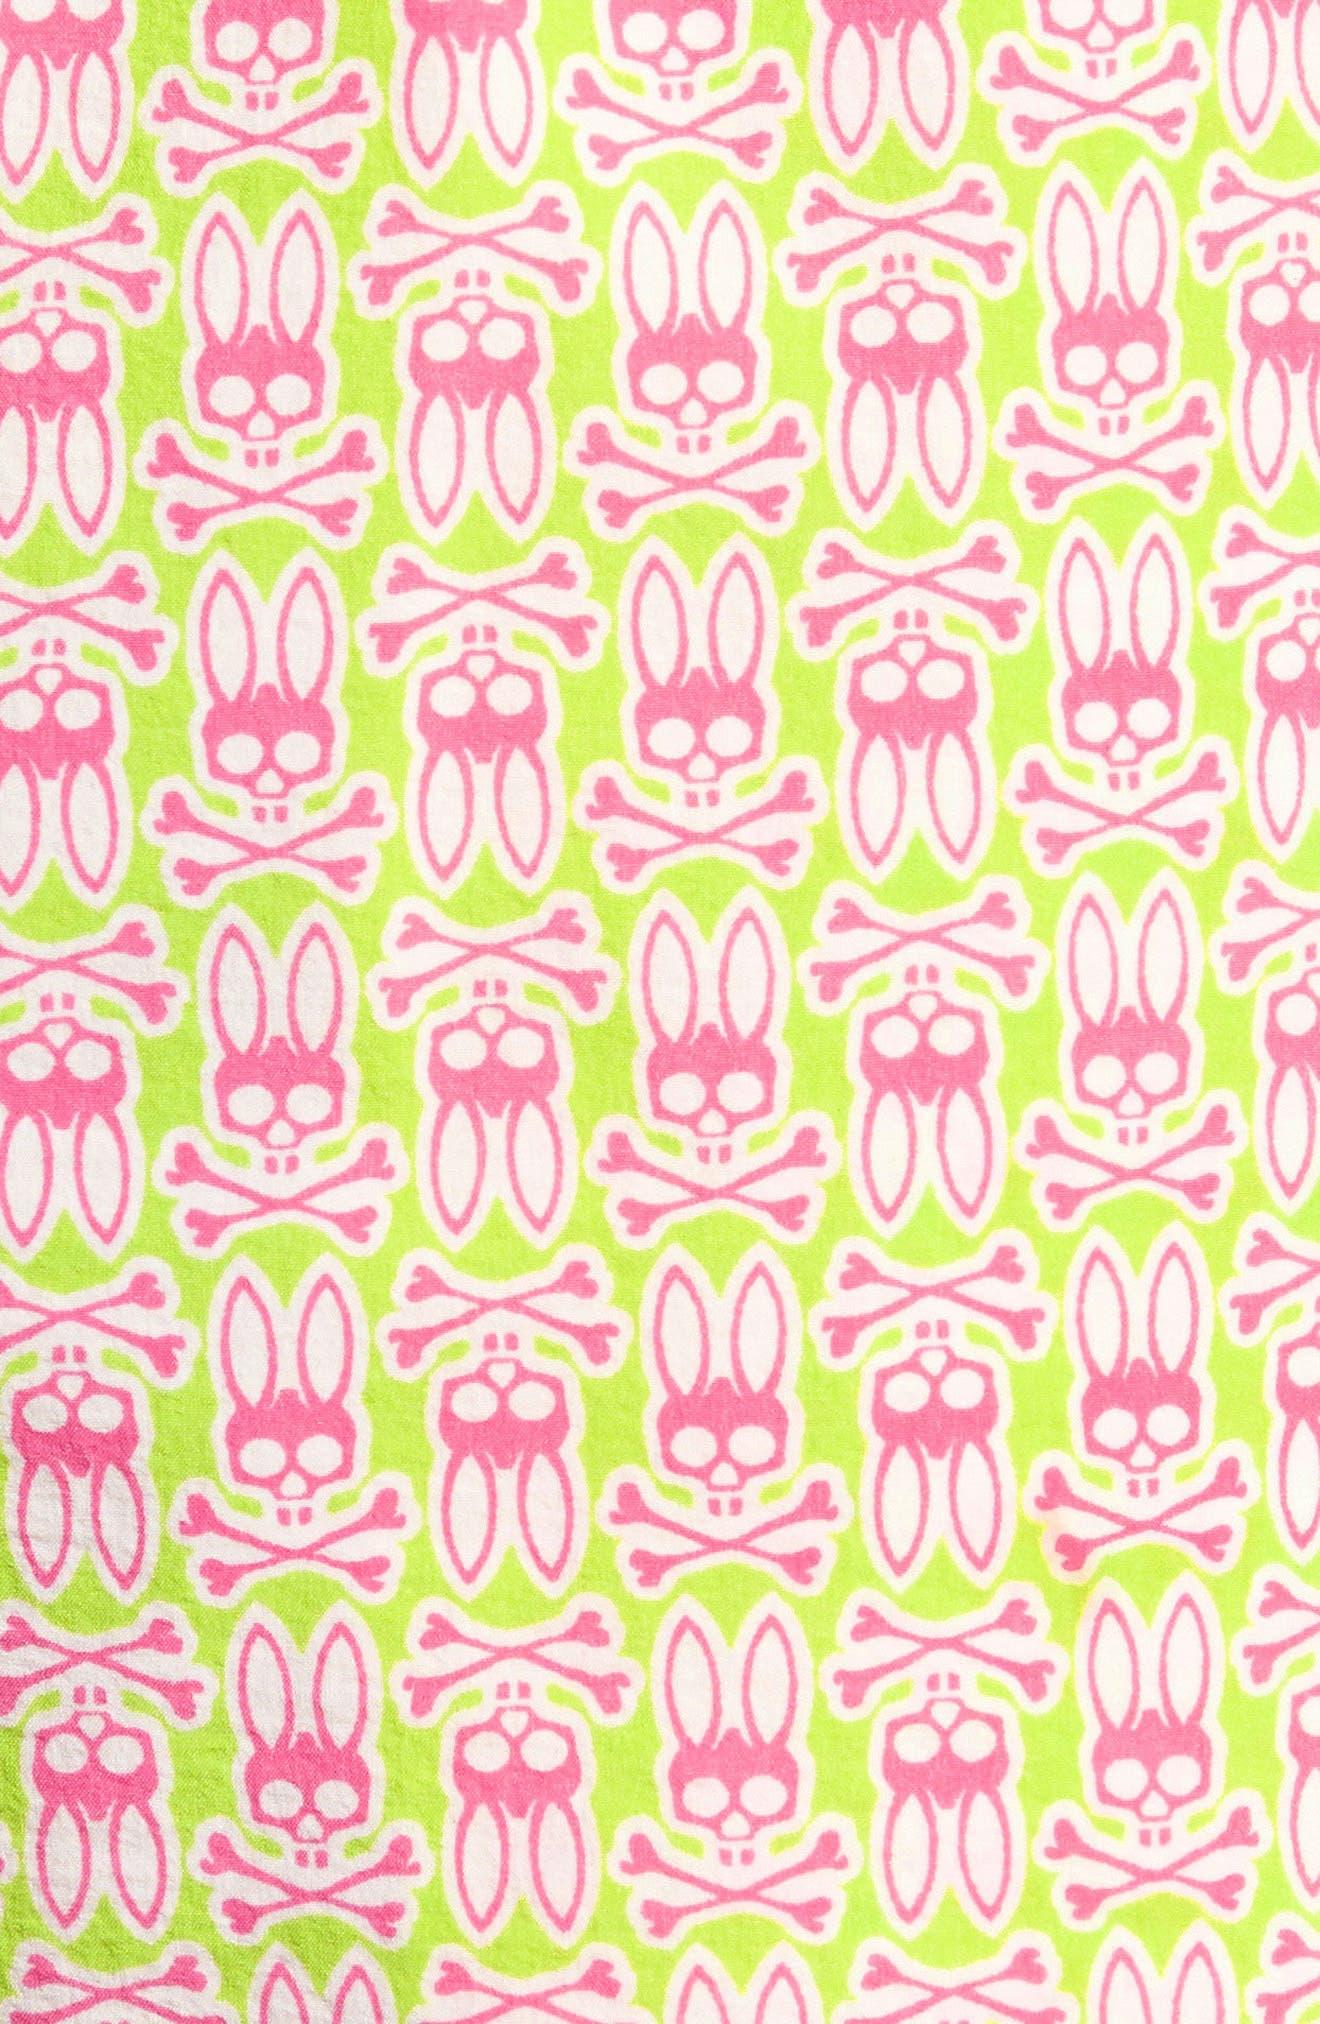 PSYCHO BUNNY BOTTOMS,                             Psycho Bunny Print Swim Trunks,                             Alternate thumbnail 5, color,                             700